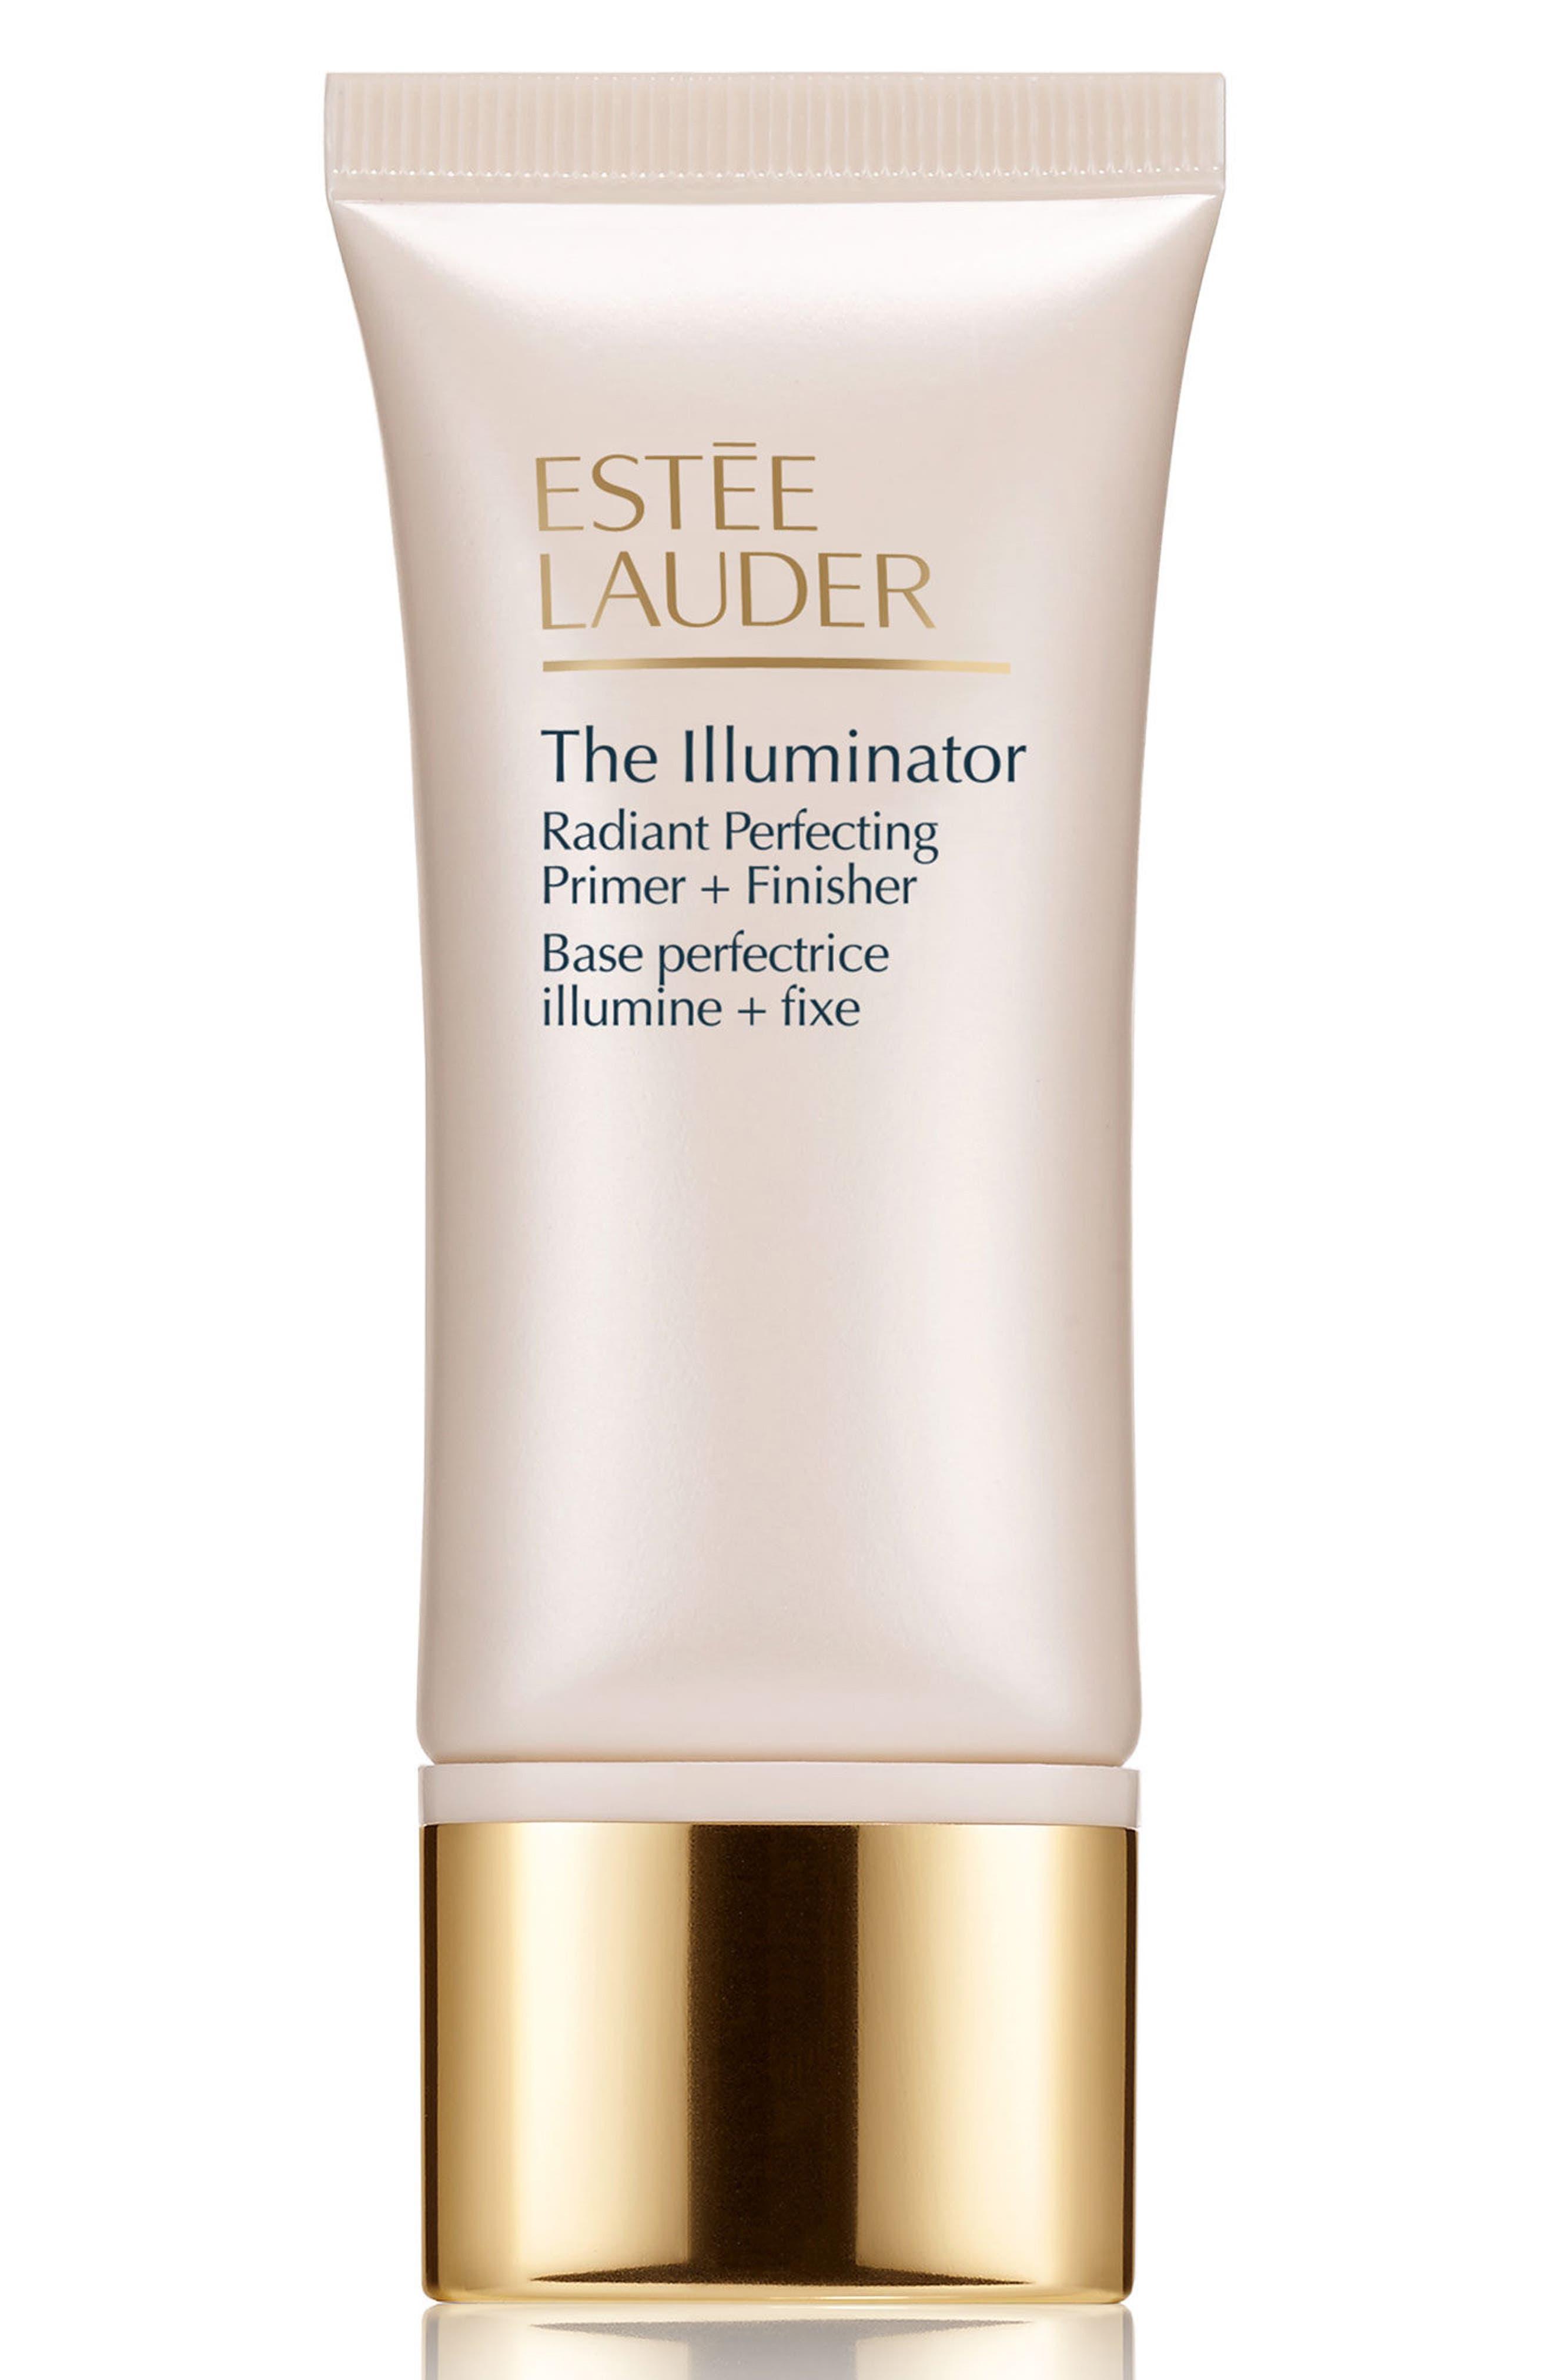 Main Image - Estée Lauder The Illuminator Radiant Perfecting Primer + Finisher